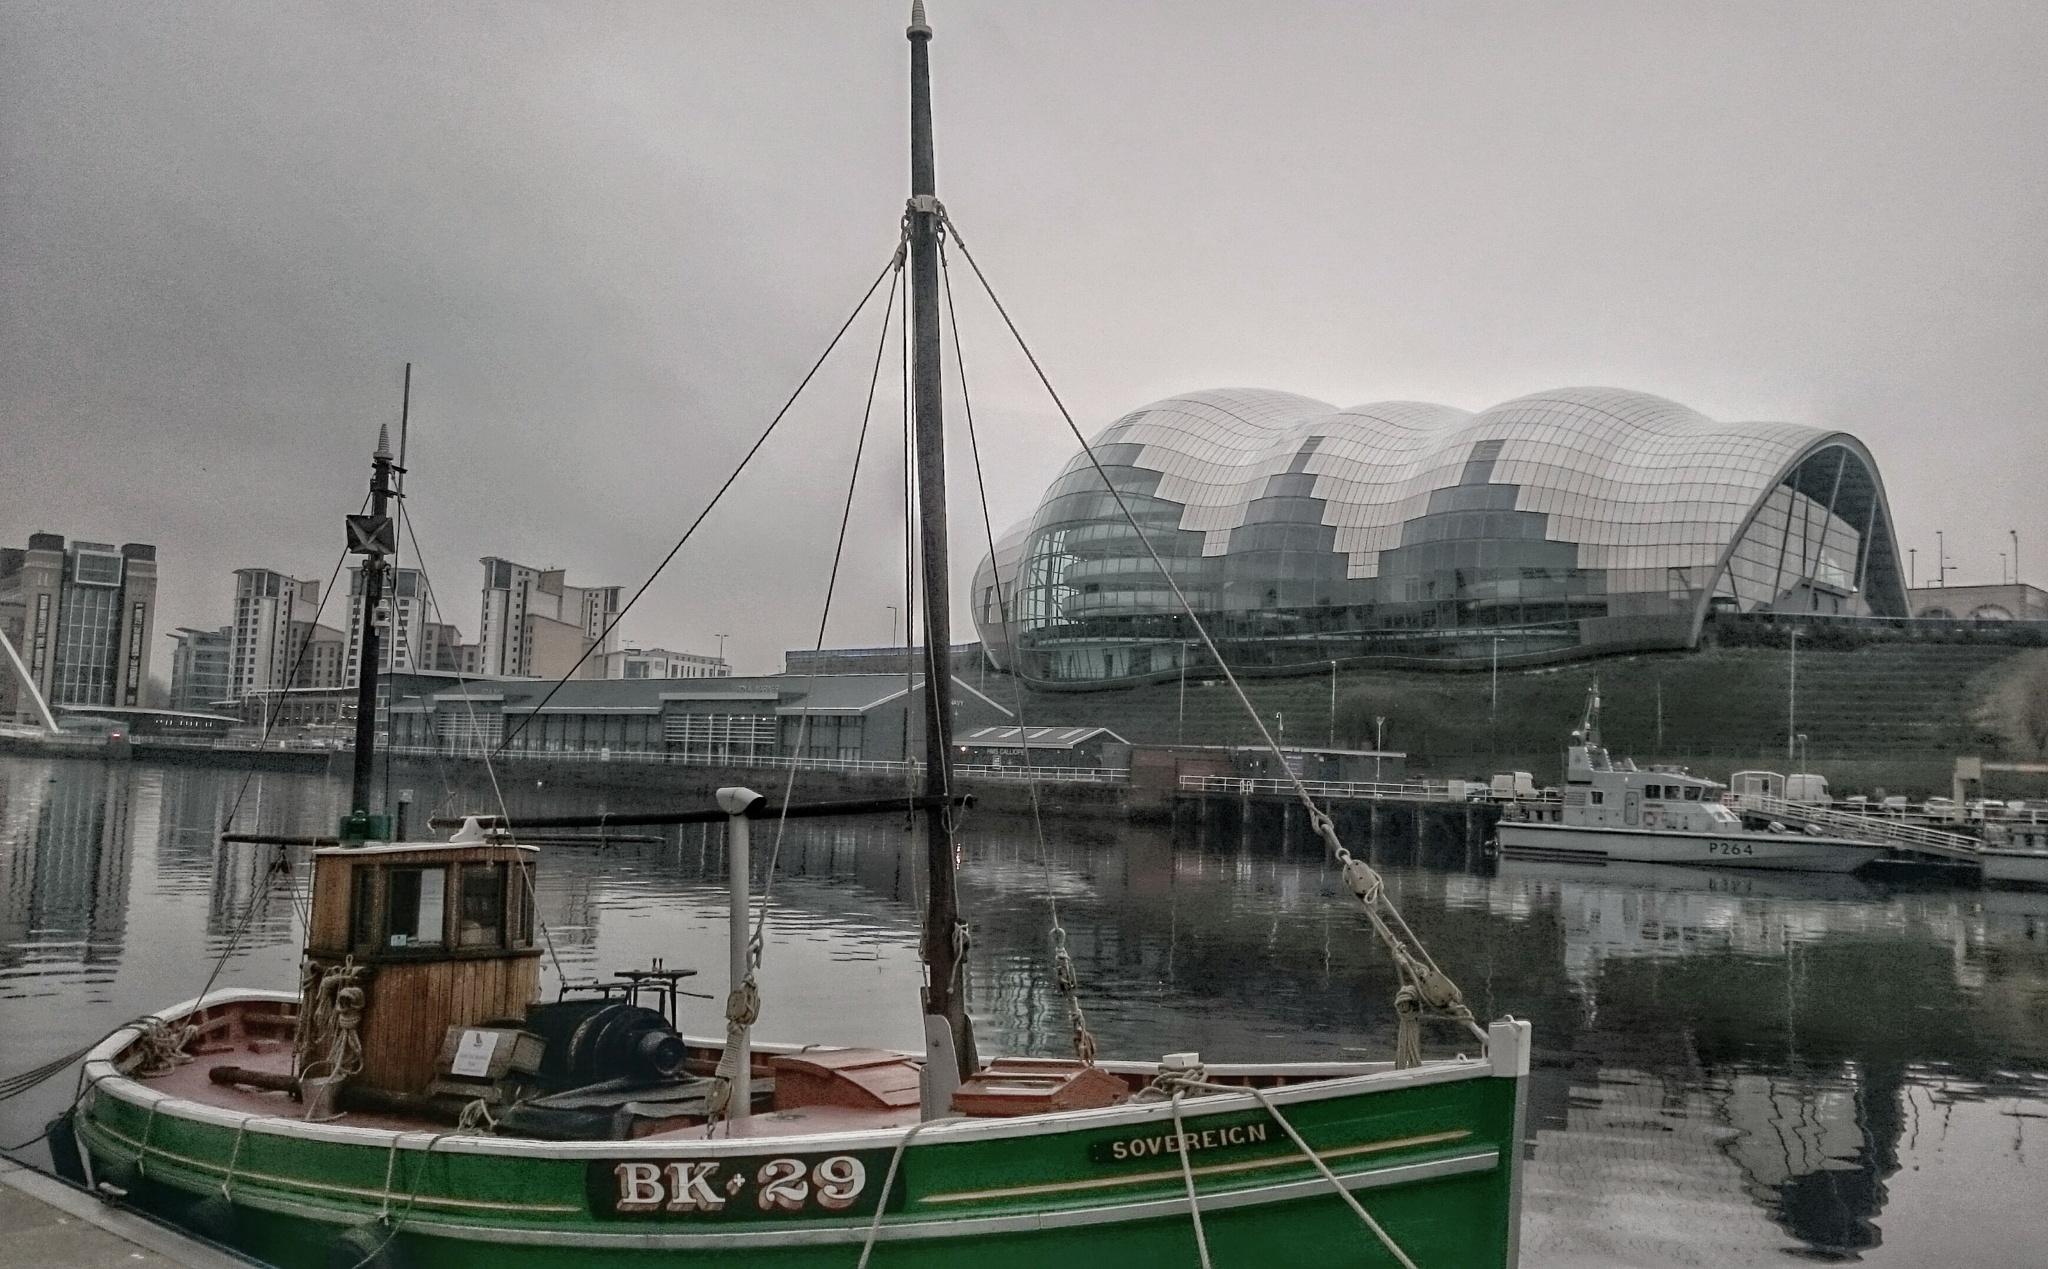 River Tyne today  by Darren Turner